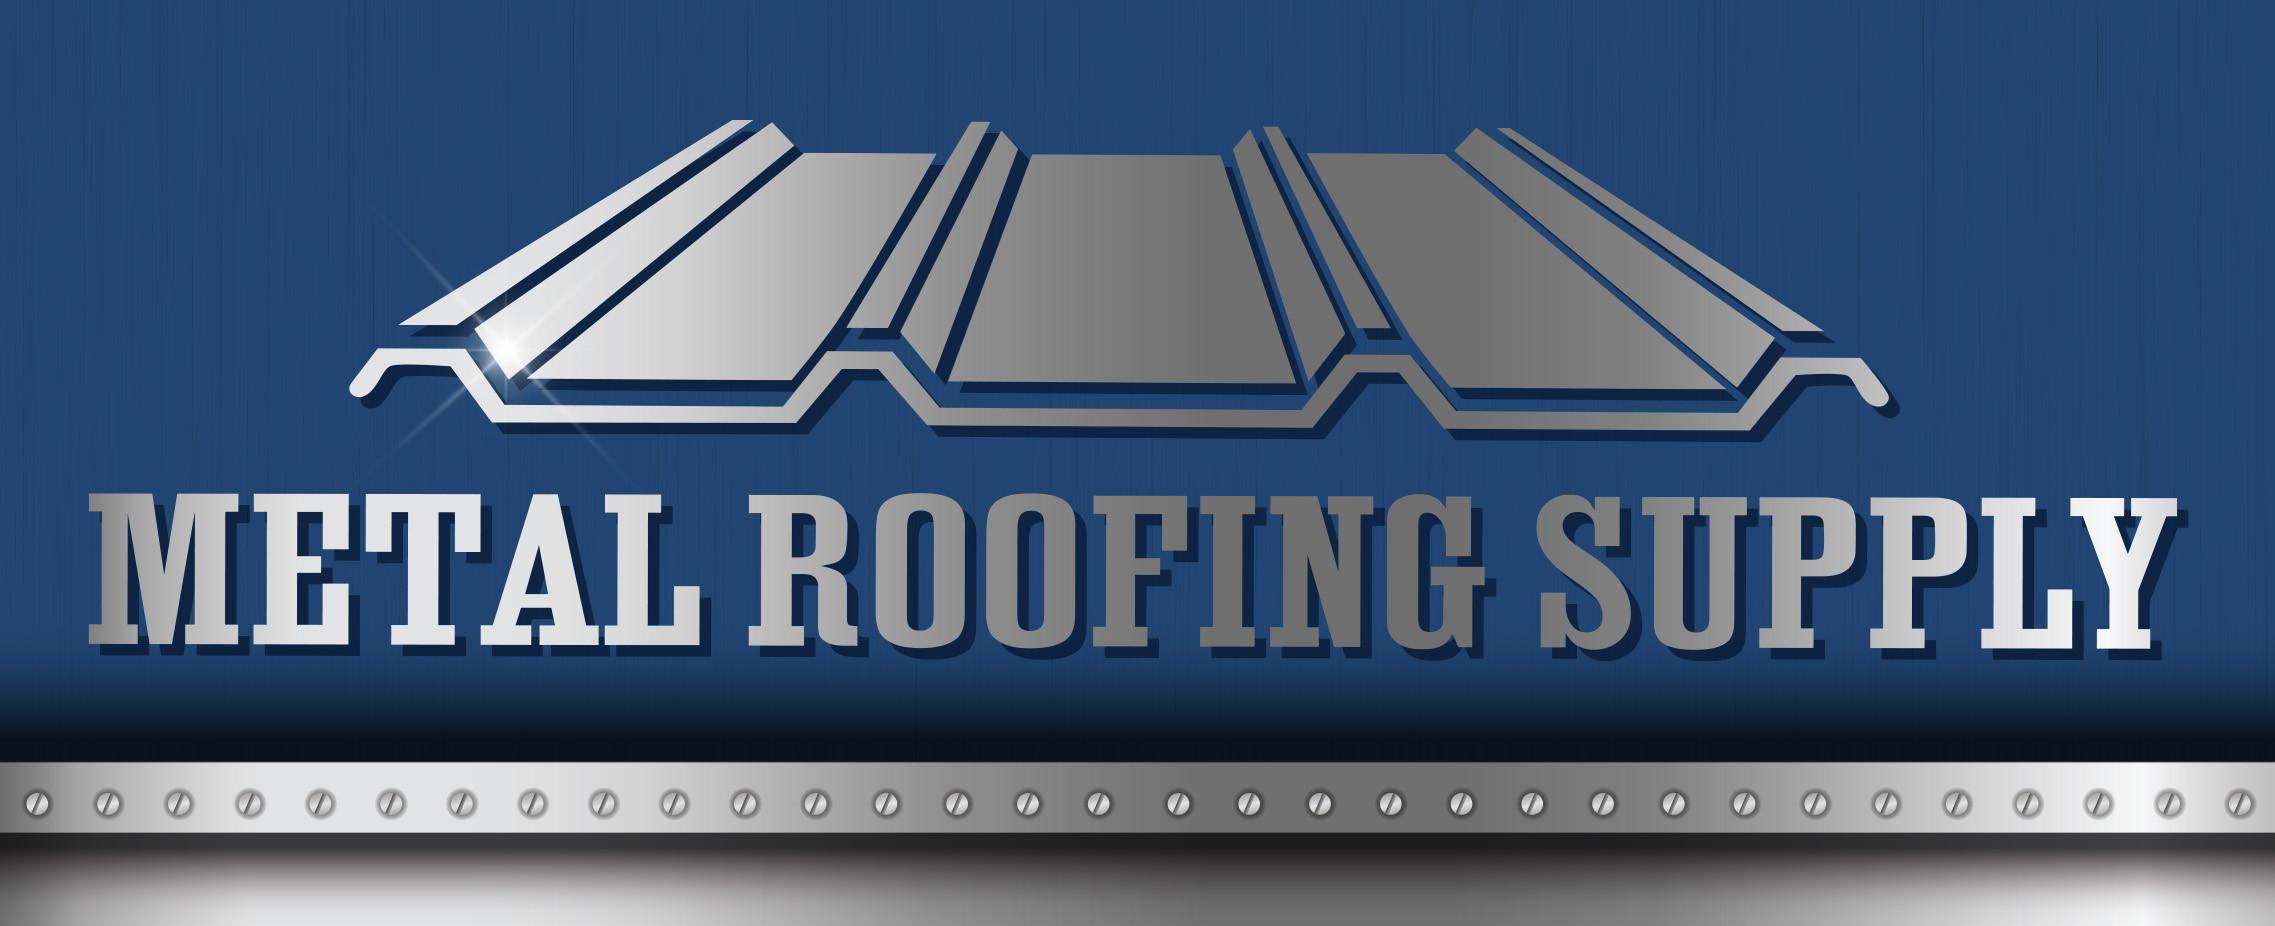 Metal Roofing Arkansas United States Metalroofingsupply Org